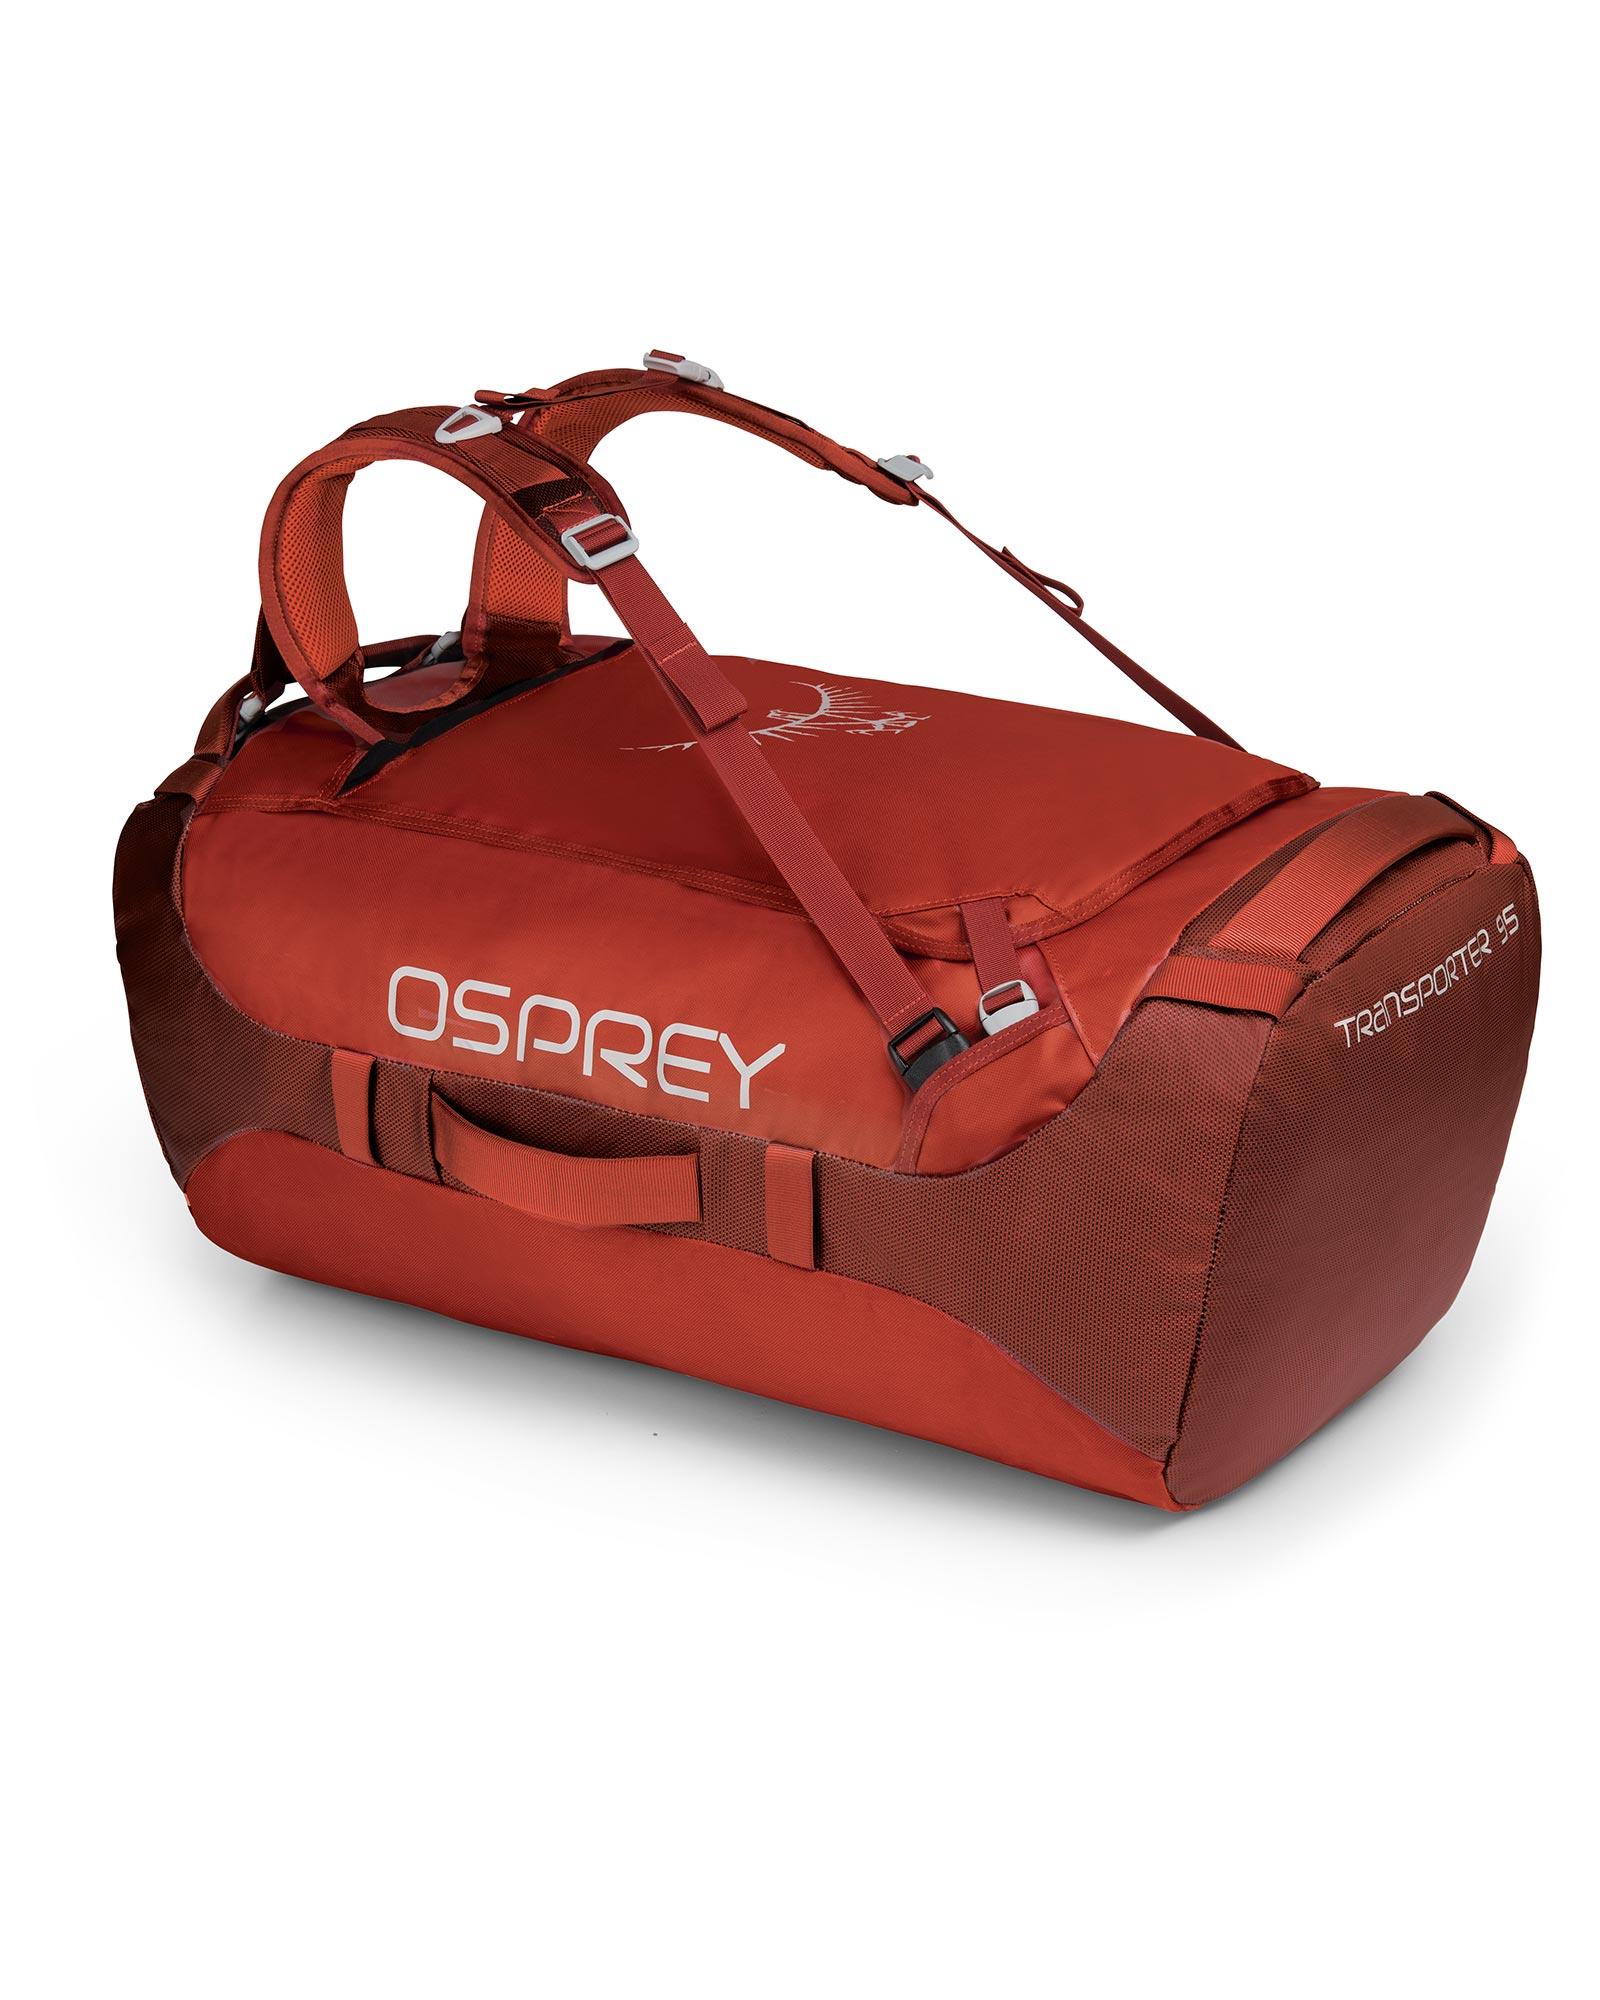 Osprey Transporter 95 Duffel 0